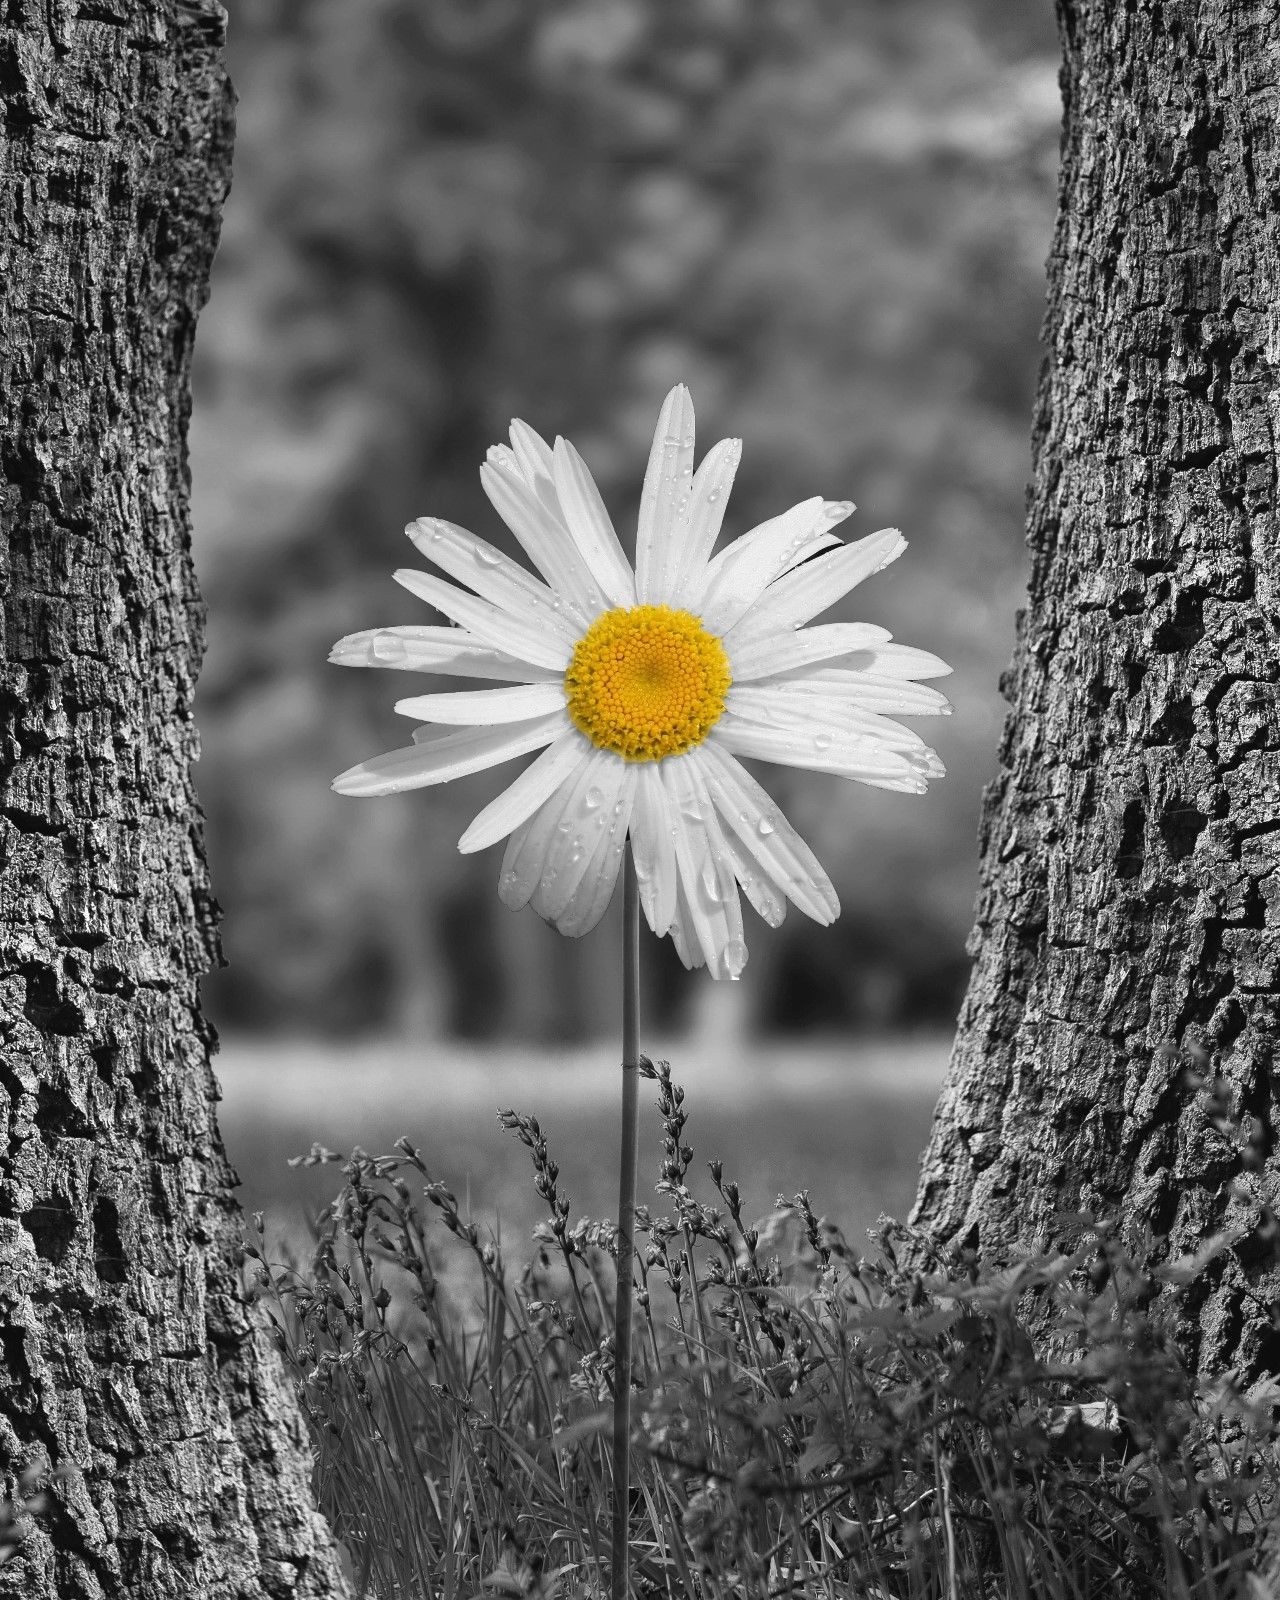 Black White Yellow Photography Artwork, Daisy Flower Decor